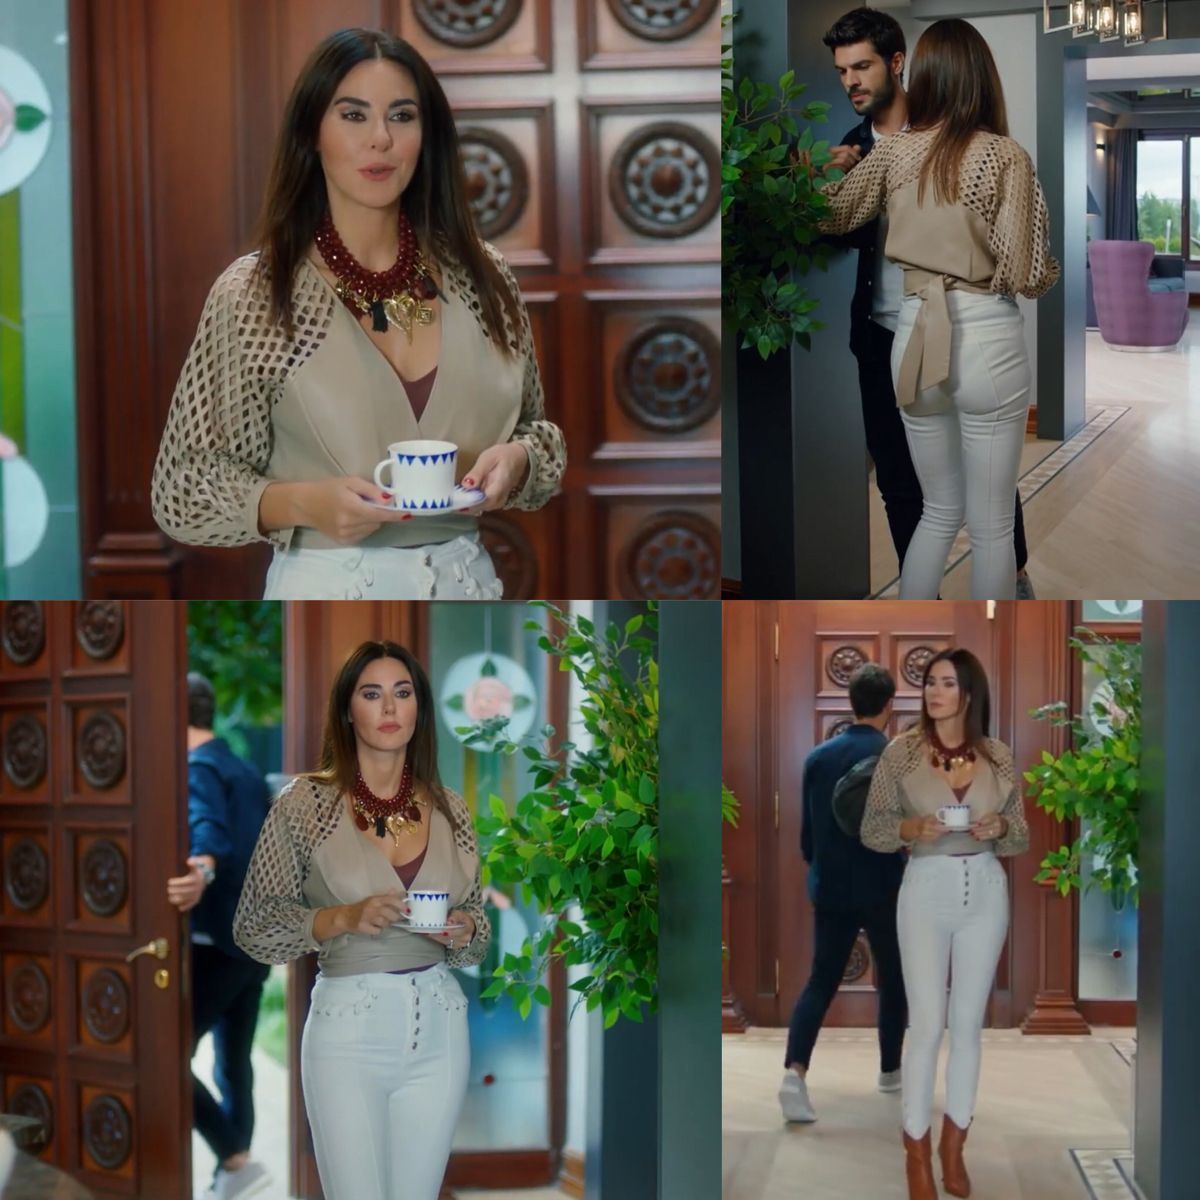 Sol Yanim Asena Bolum 3 Tv Show Outfits Outfits Tv Shows